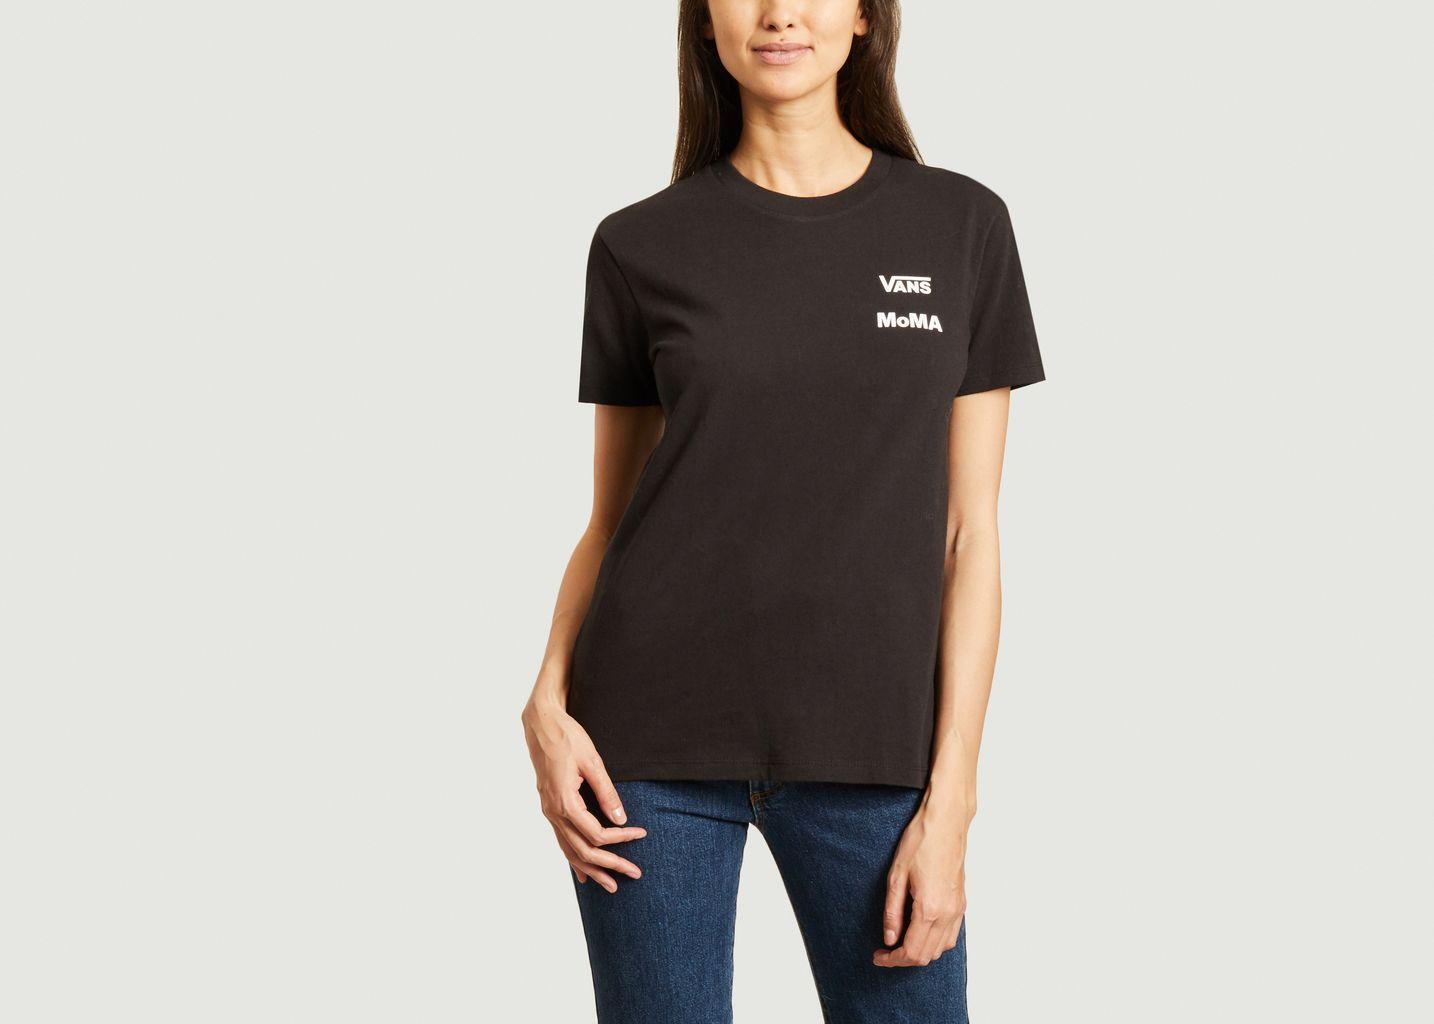 T-Shirt Vans X MoMA  - Vans